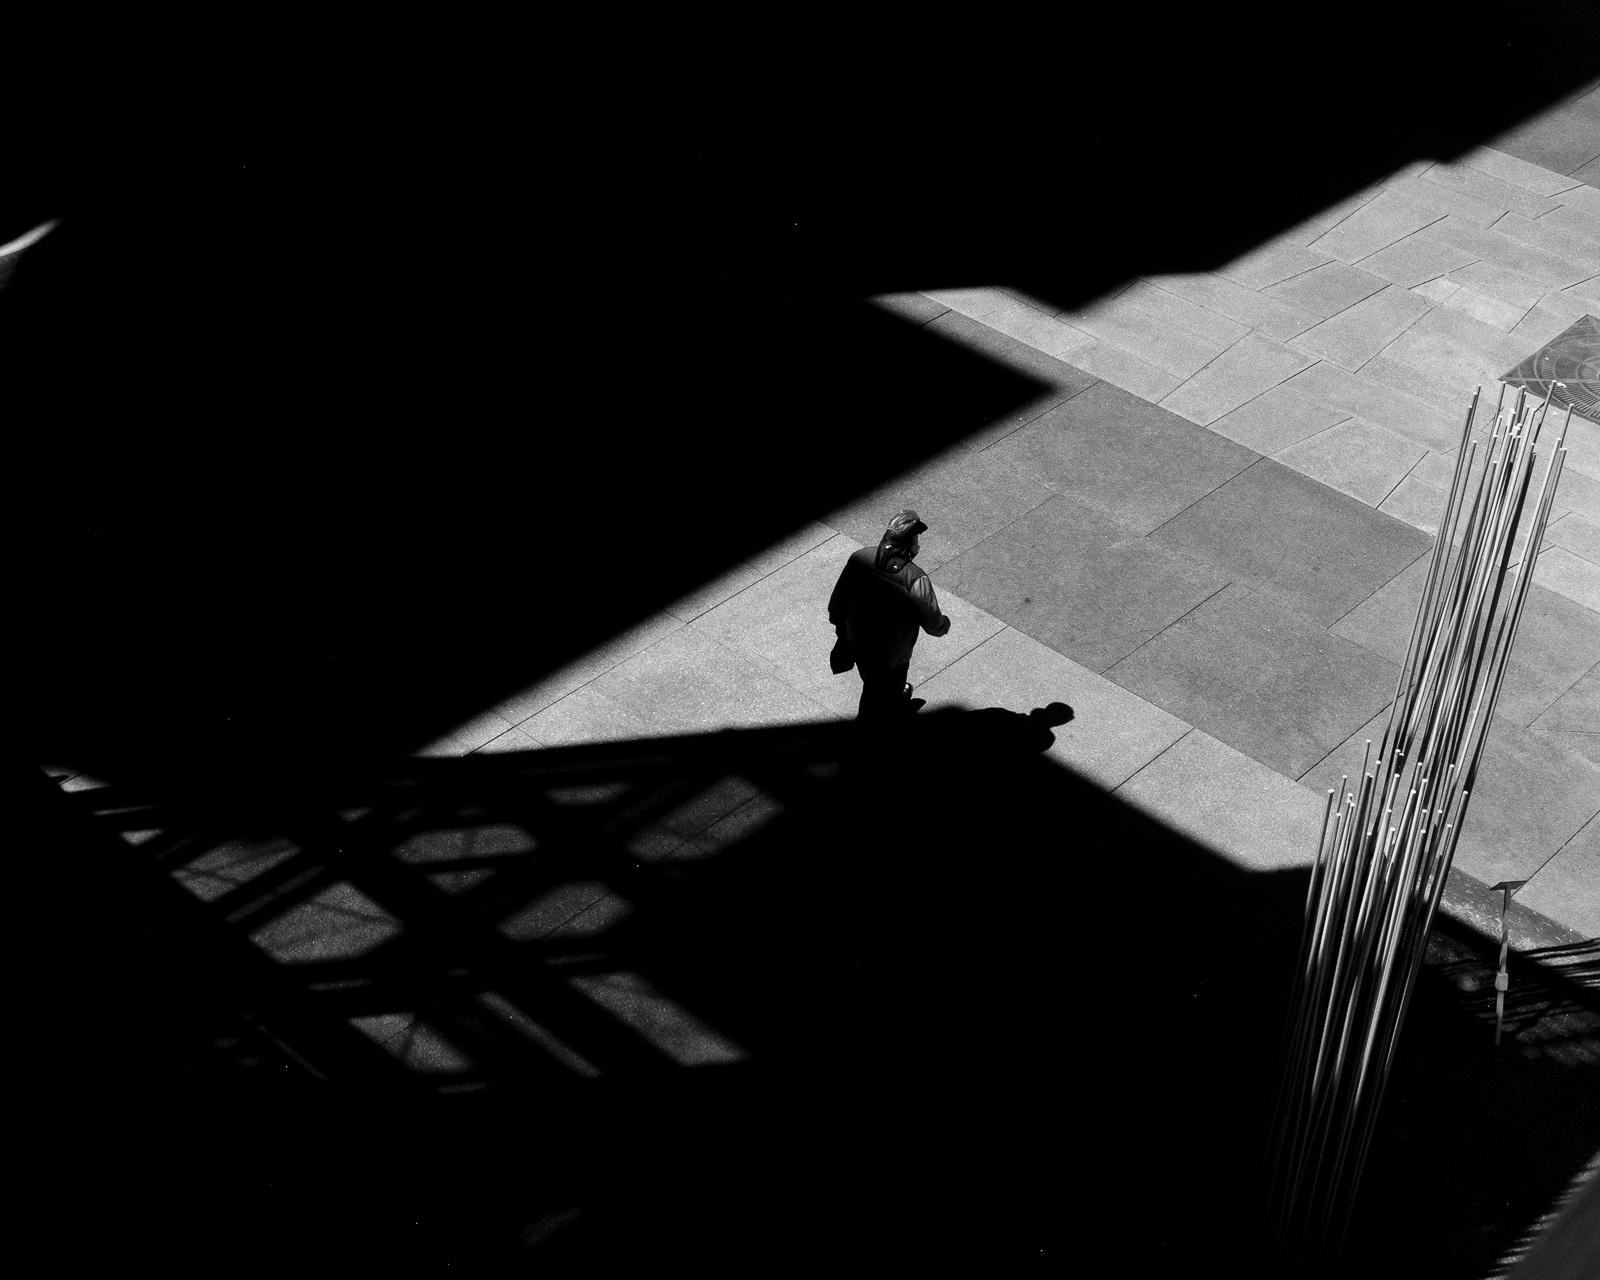 Day 133- 365 Day B&W Photo Challenge - A man walks out of the shadows below the Millenium Bridge in Denver, Colorado - Fuji X100F, Acros R Film Simulation